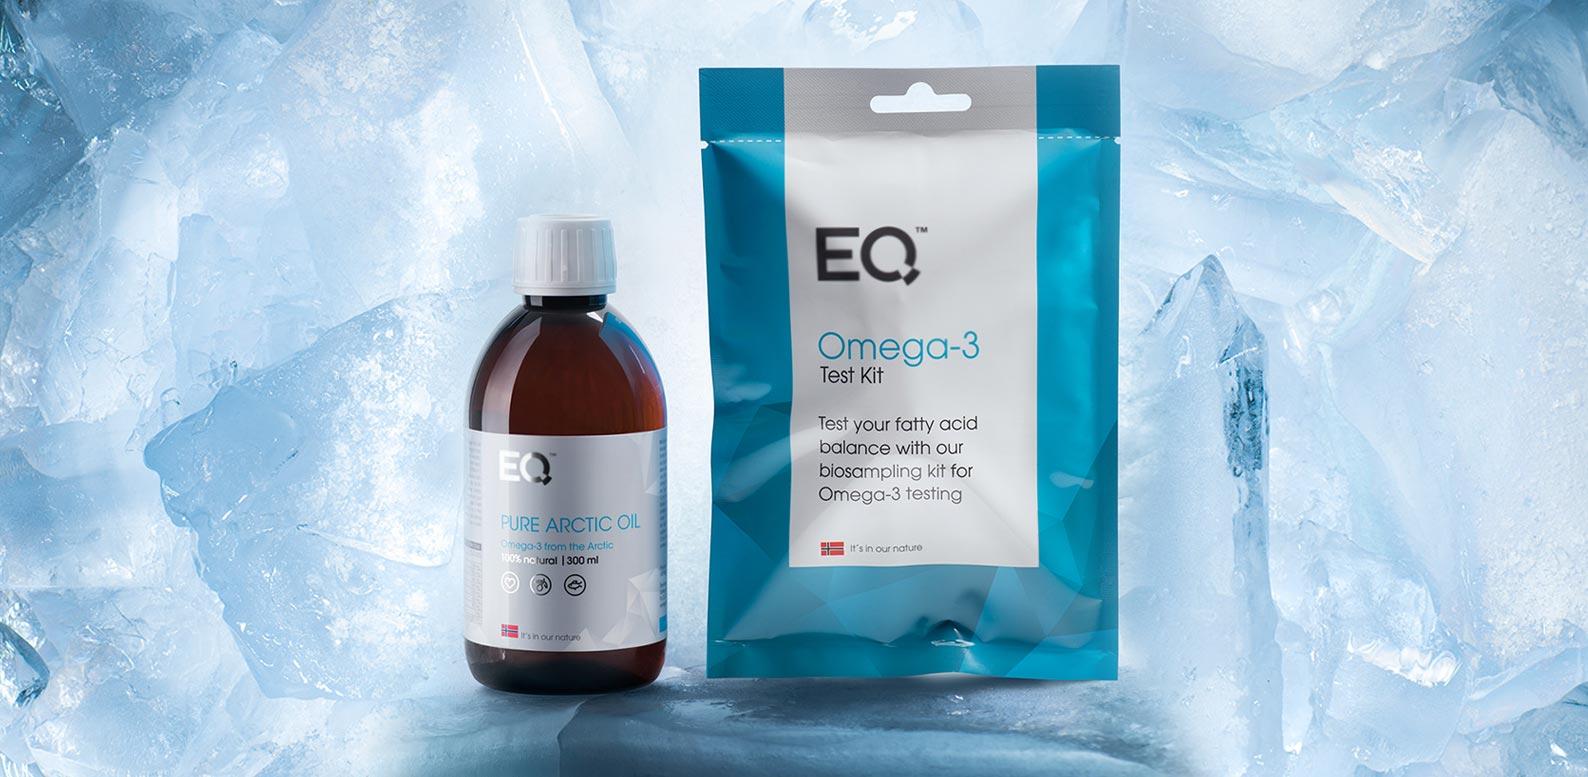 EQ pure arctic oil - EQOLOGY visolie